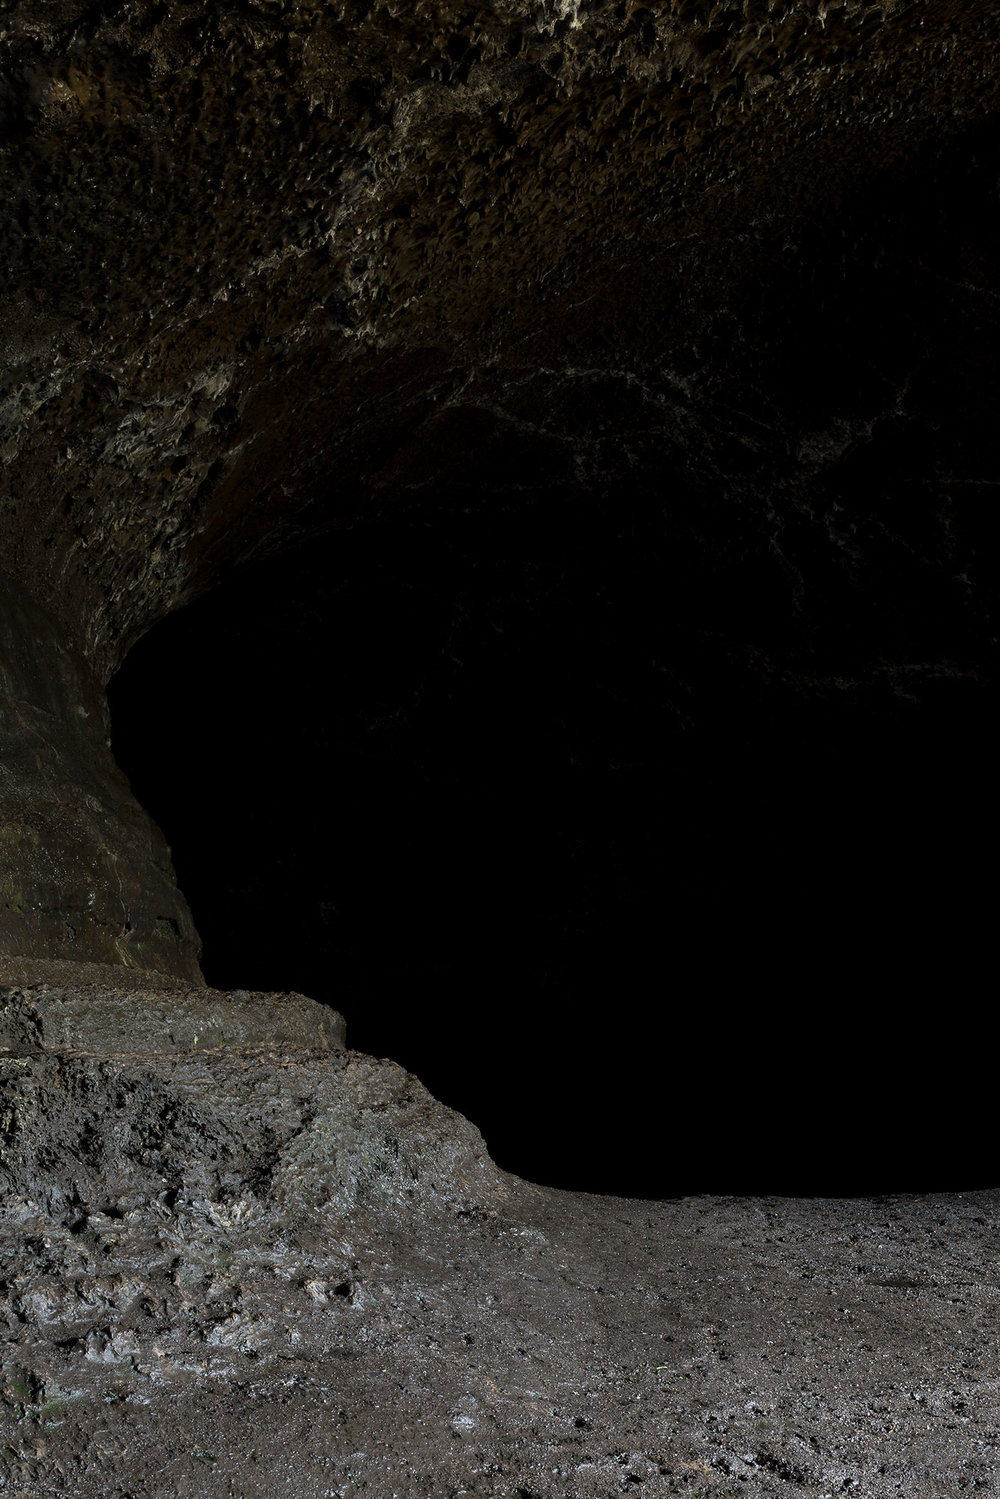 Modoc Caves 1.jpg